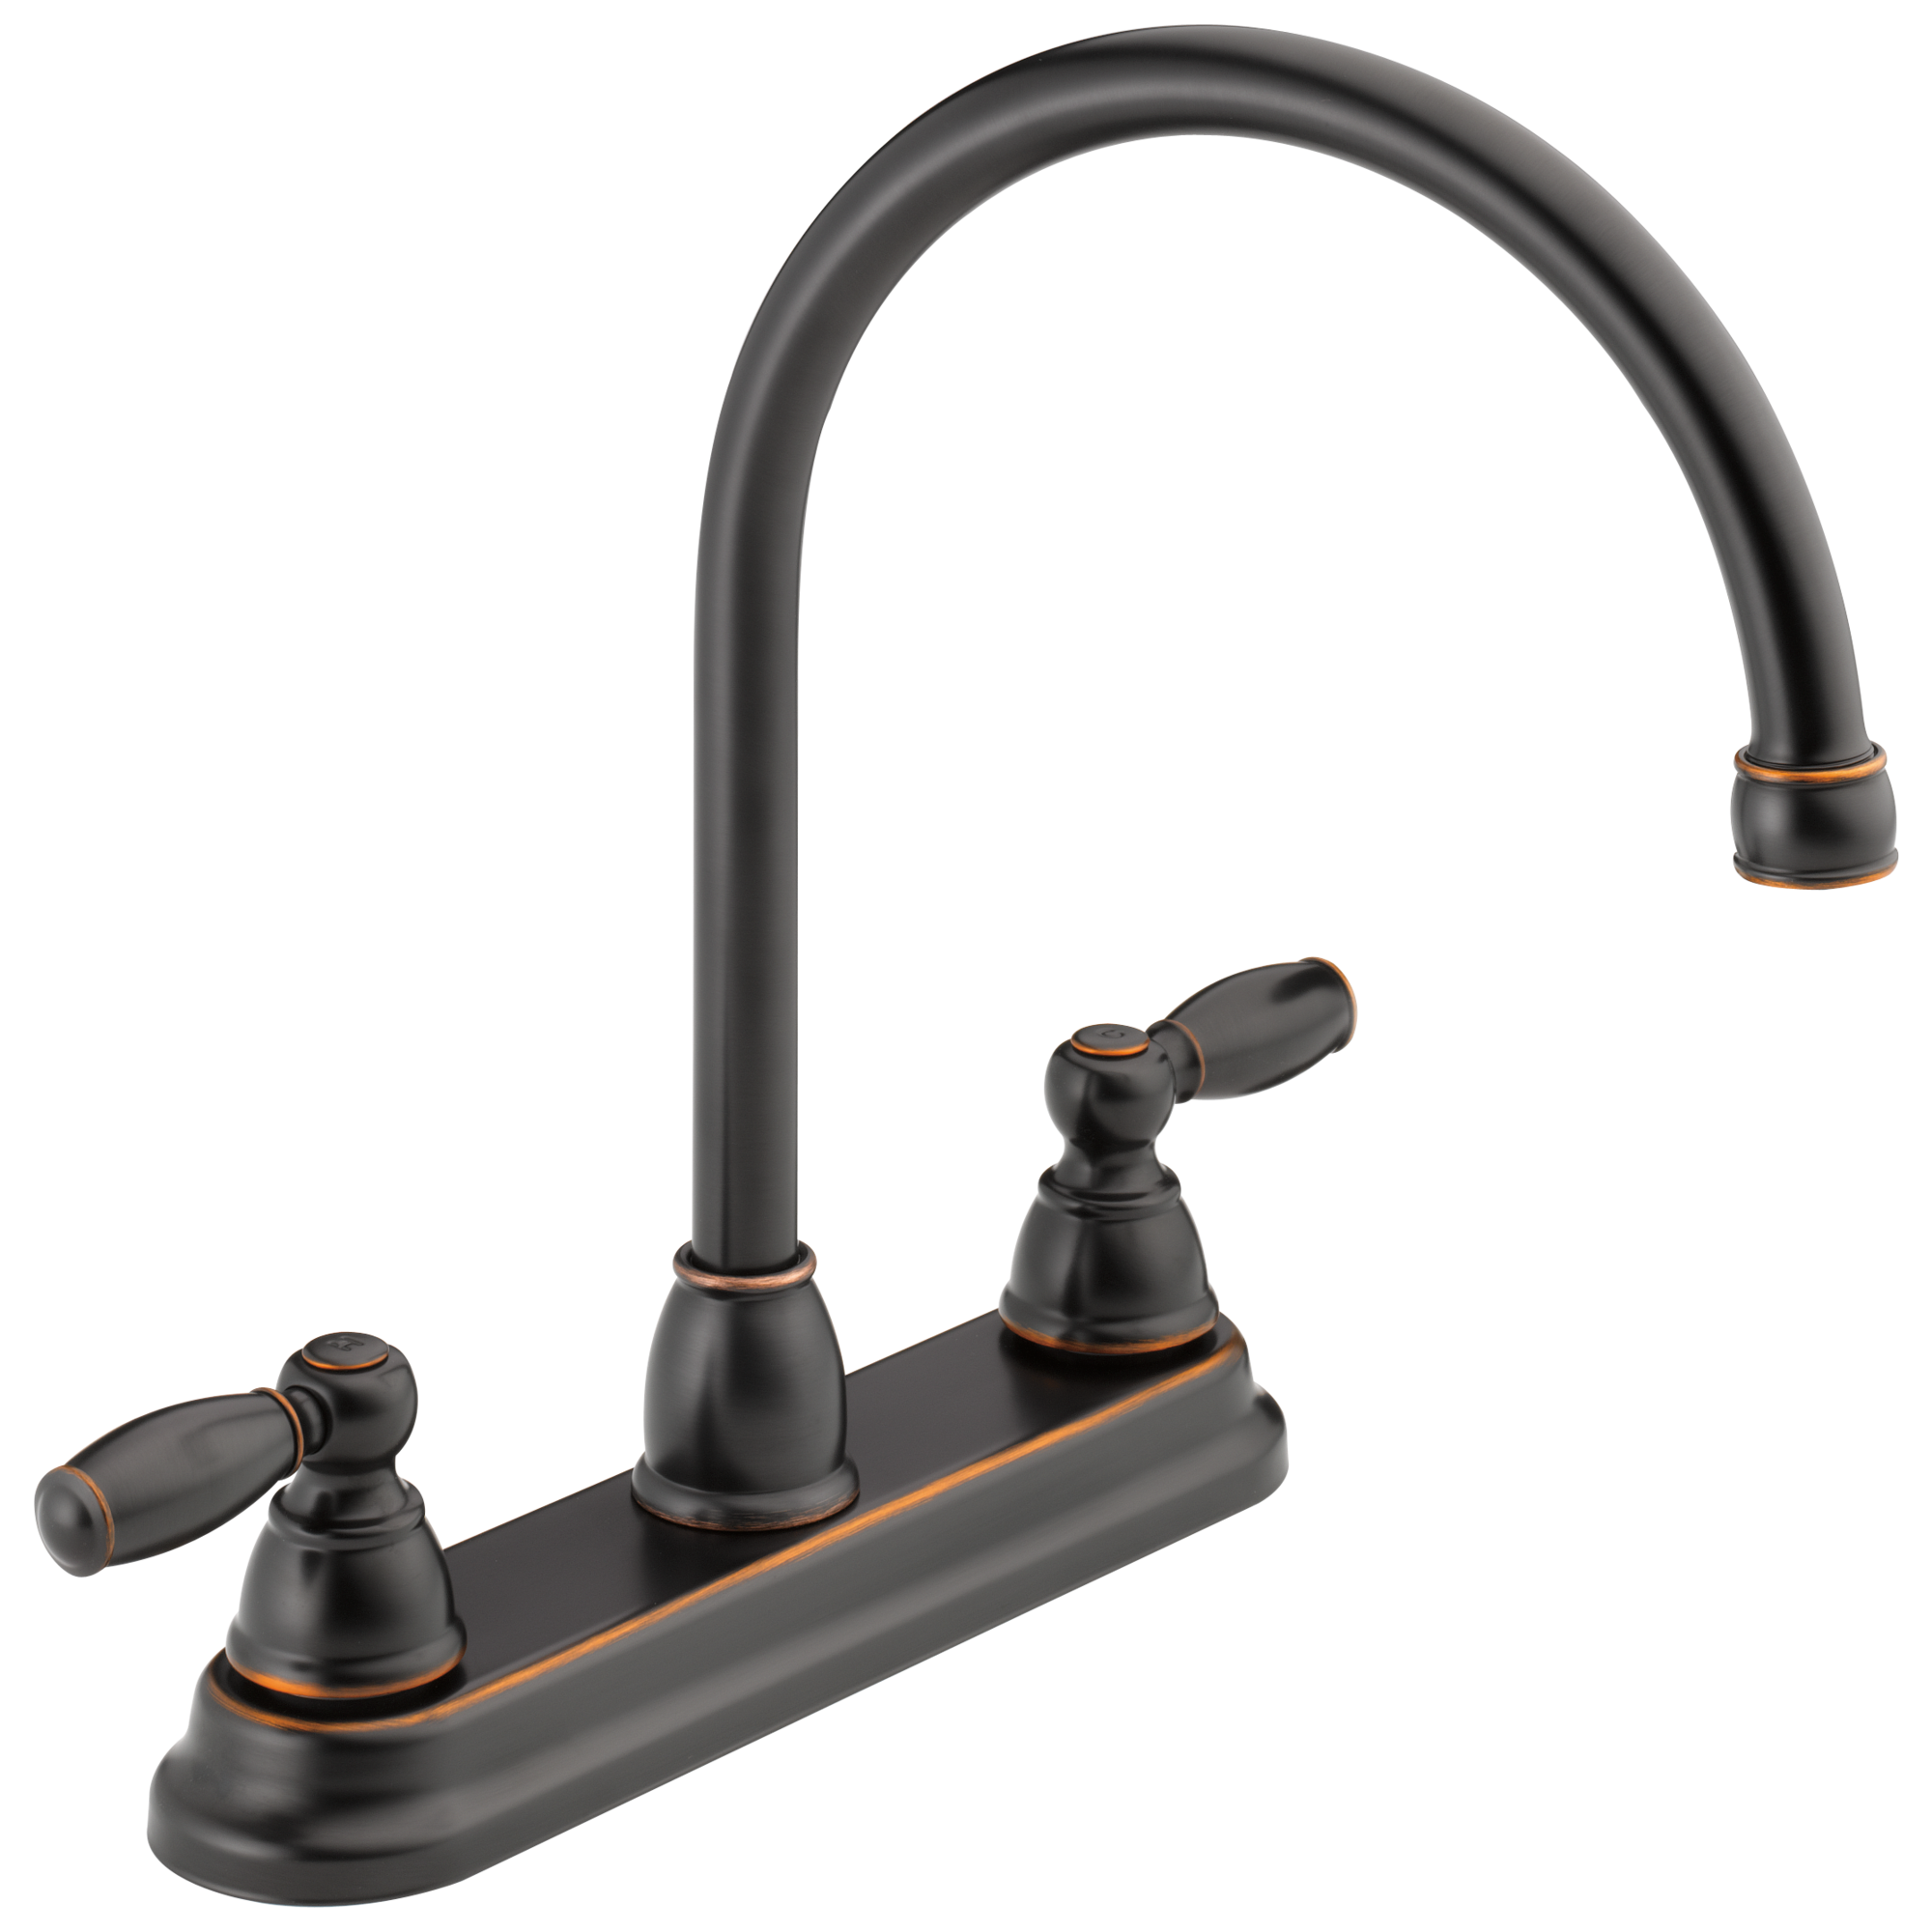 Peerless Faucet P299565lf Ob Two Handle Kitchen Faucet Oil Bronze